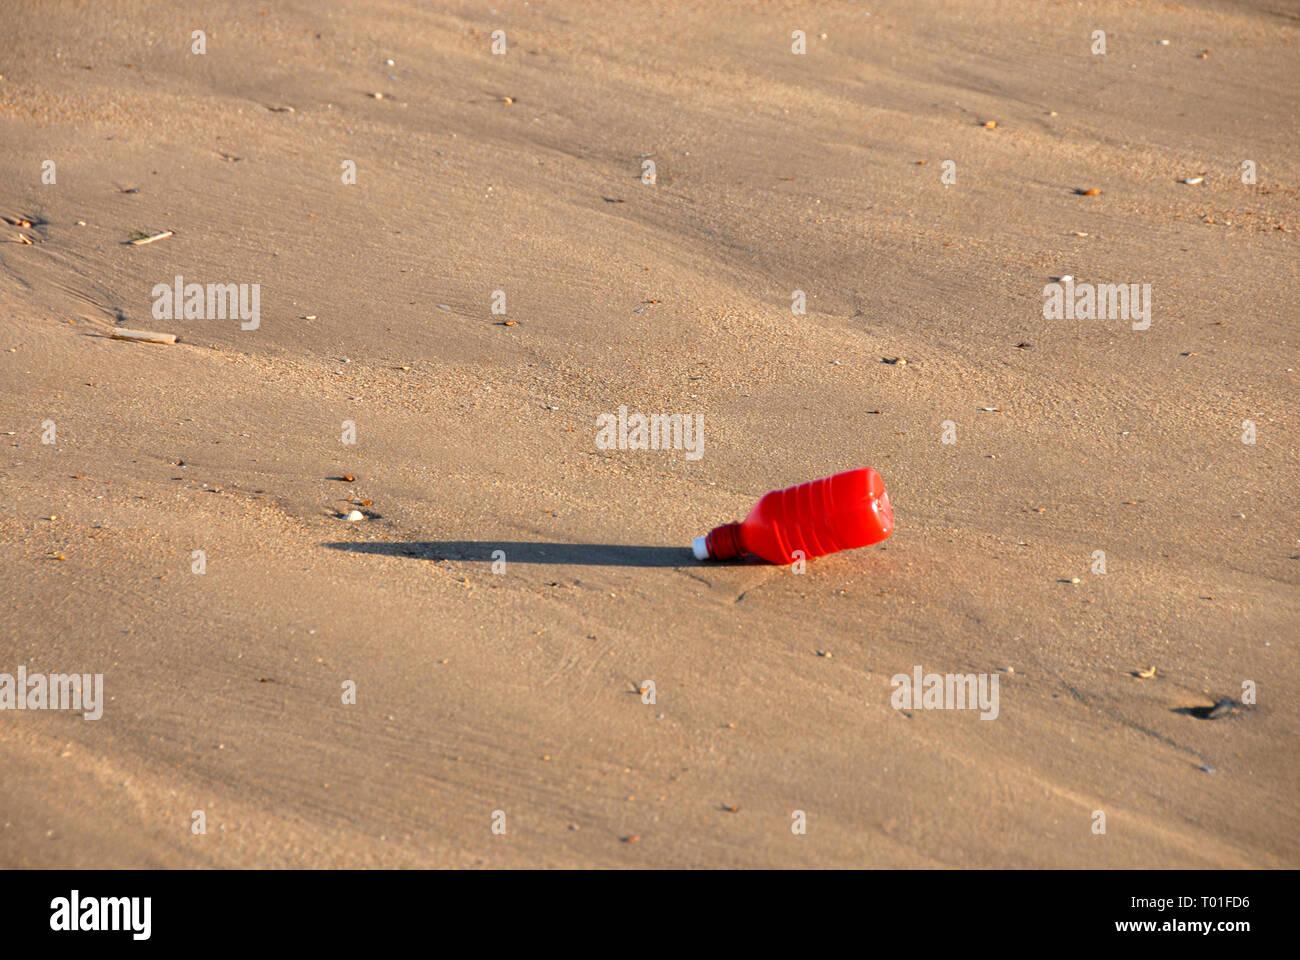 Single red plastic bottle discarded on sandy beach, Hunstanton, Norfolk, England - Stock Image